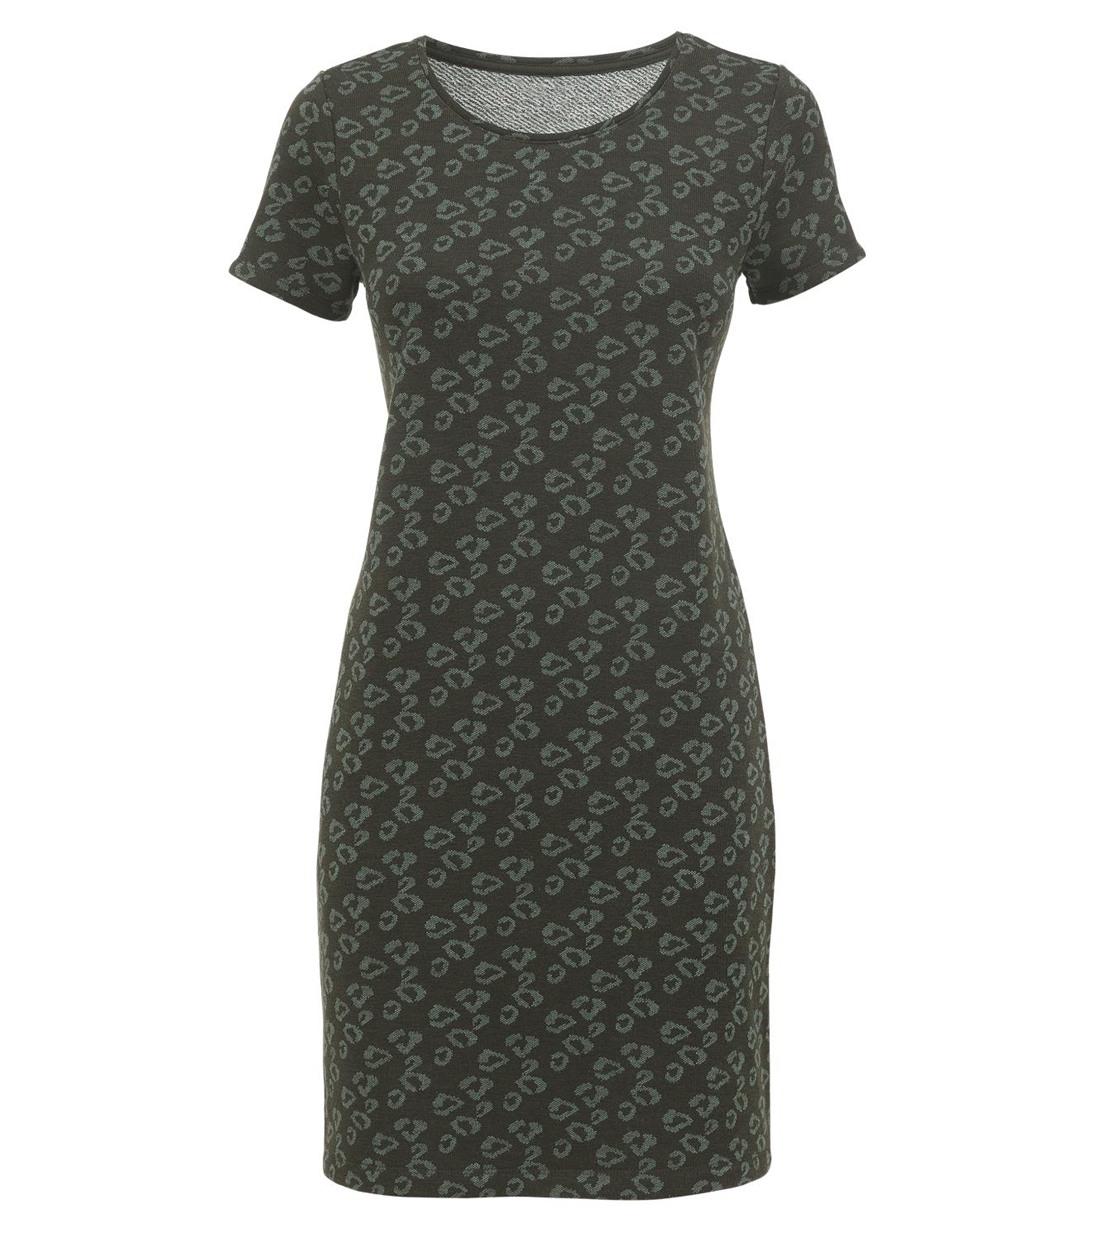 Top Kleid Olivgrün DesignFormal Genial Kleid Olivgrün Galerie